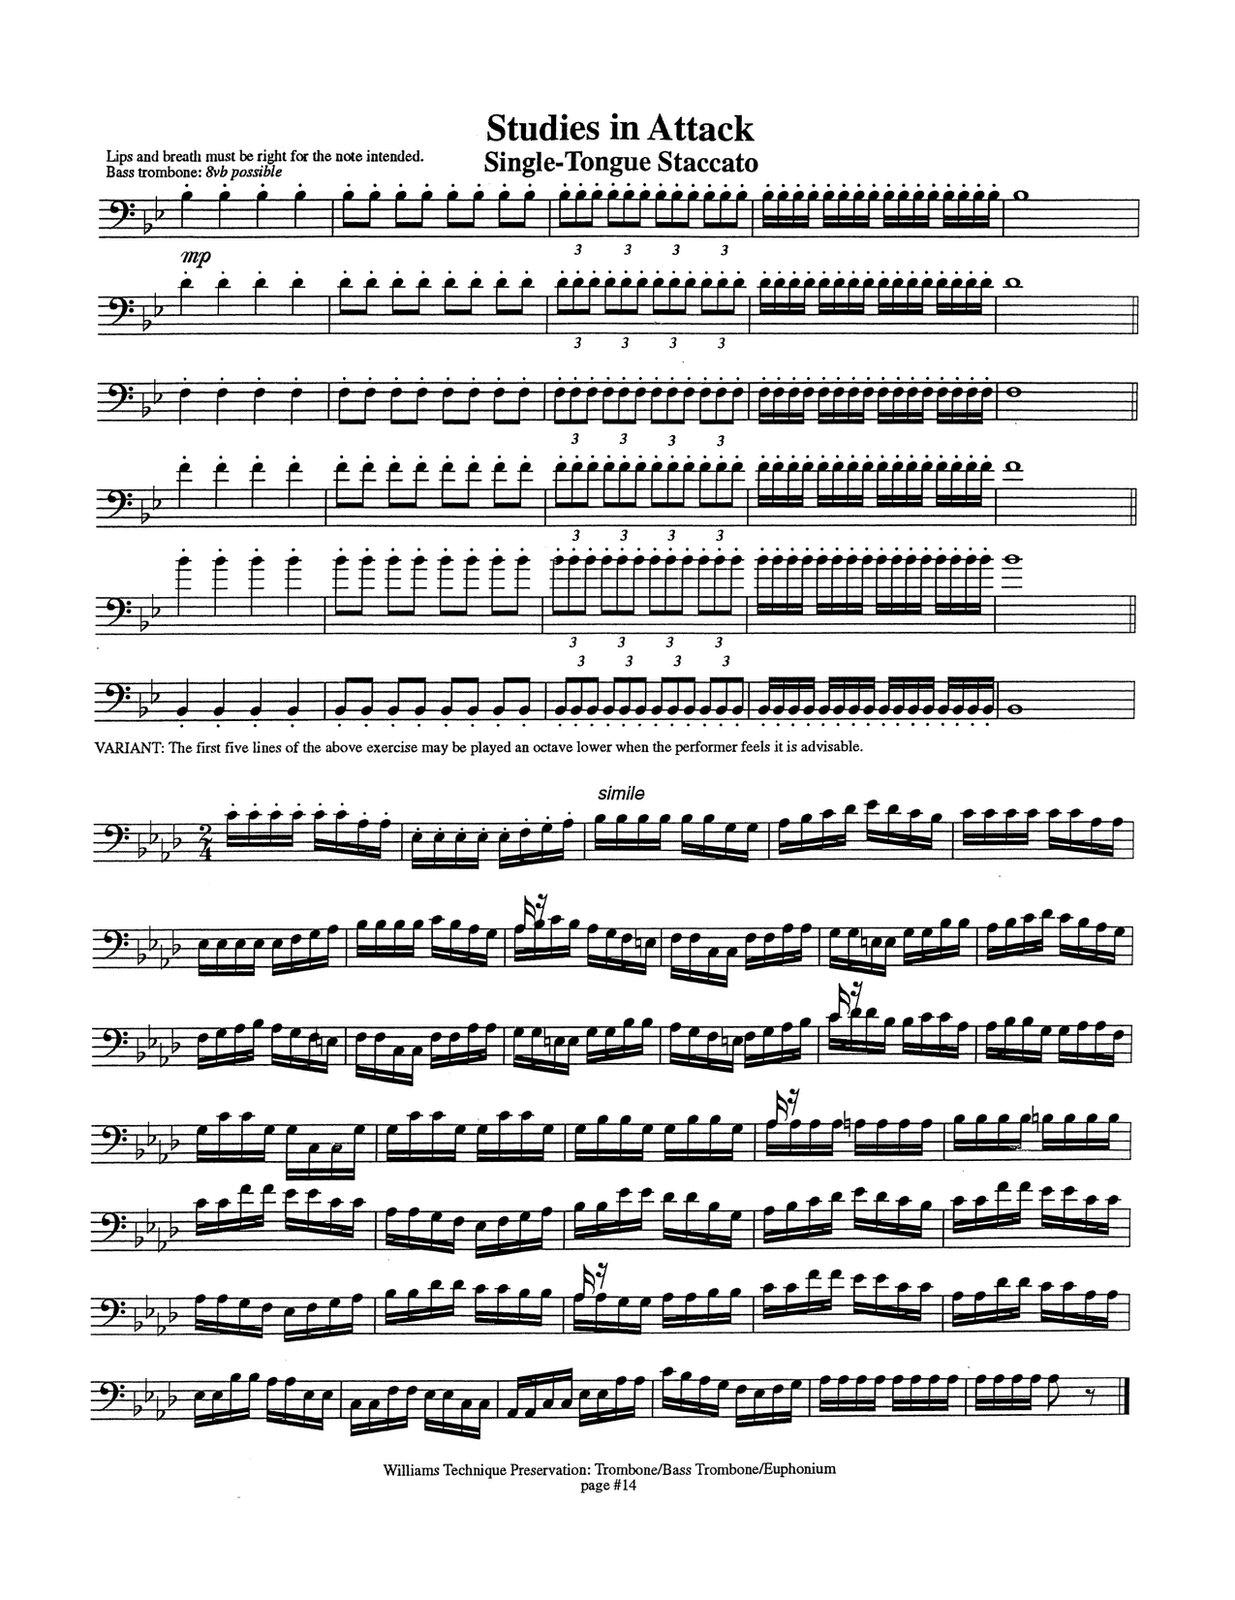 Williams, Secret of Technique Presevation for Trombone 3